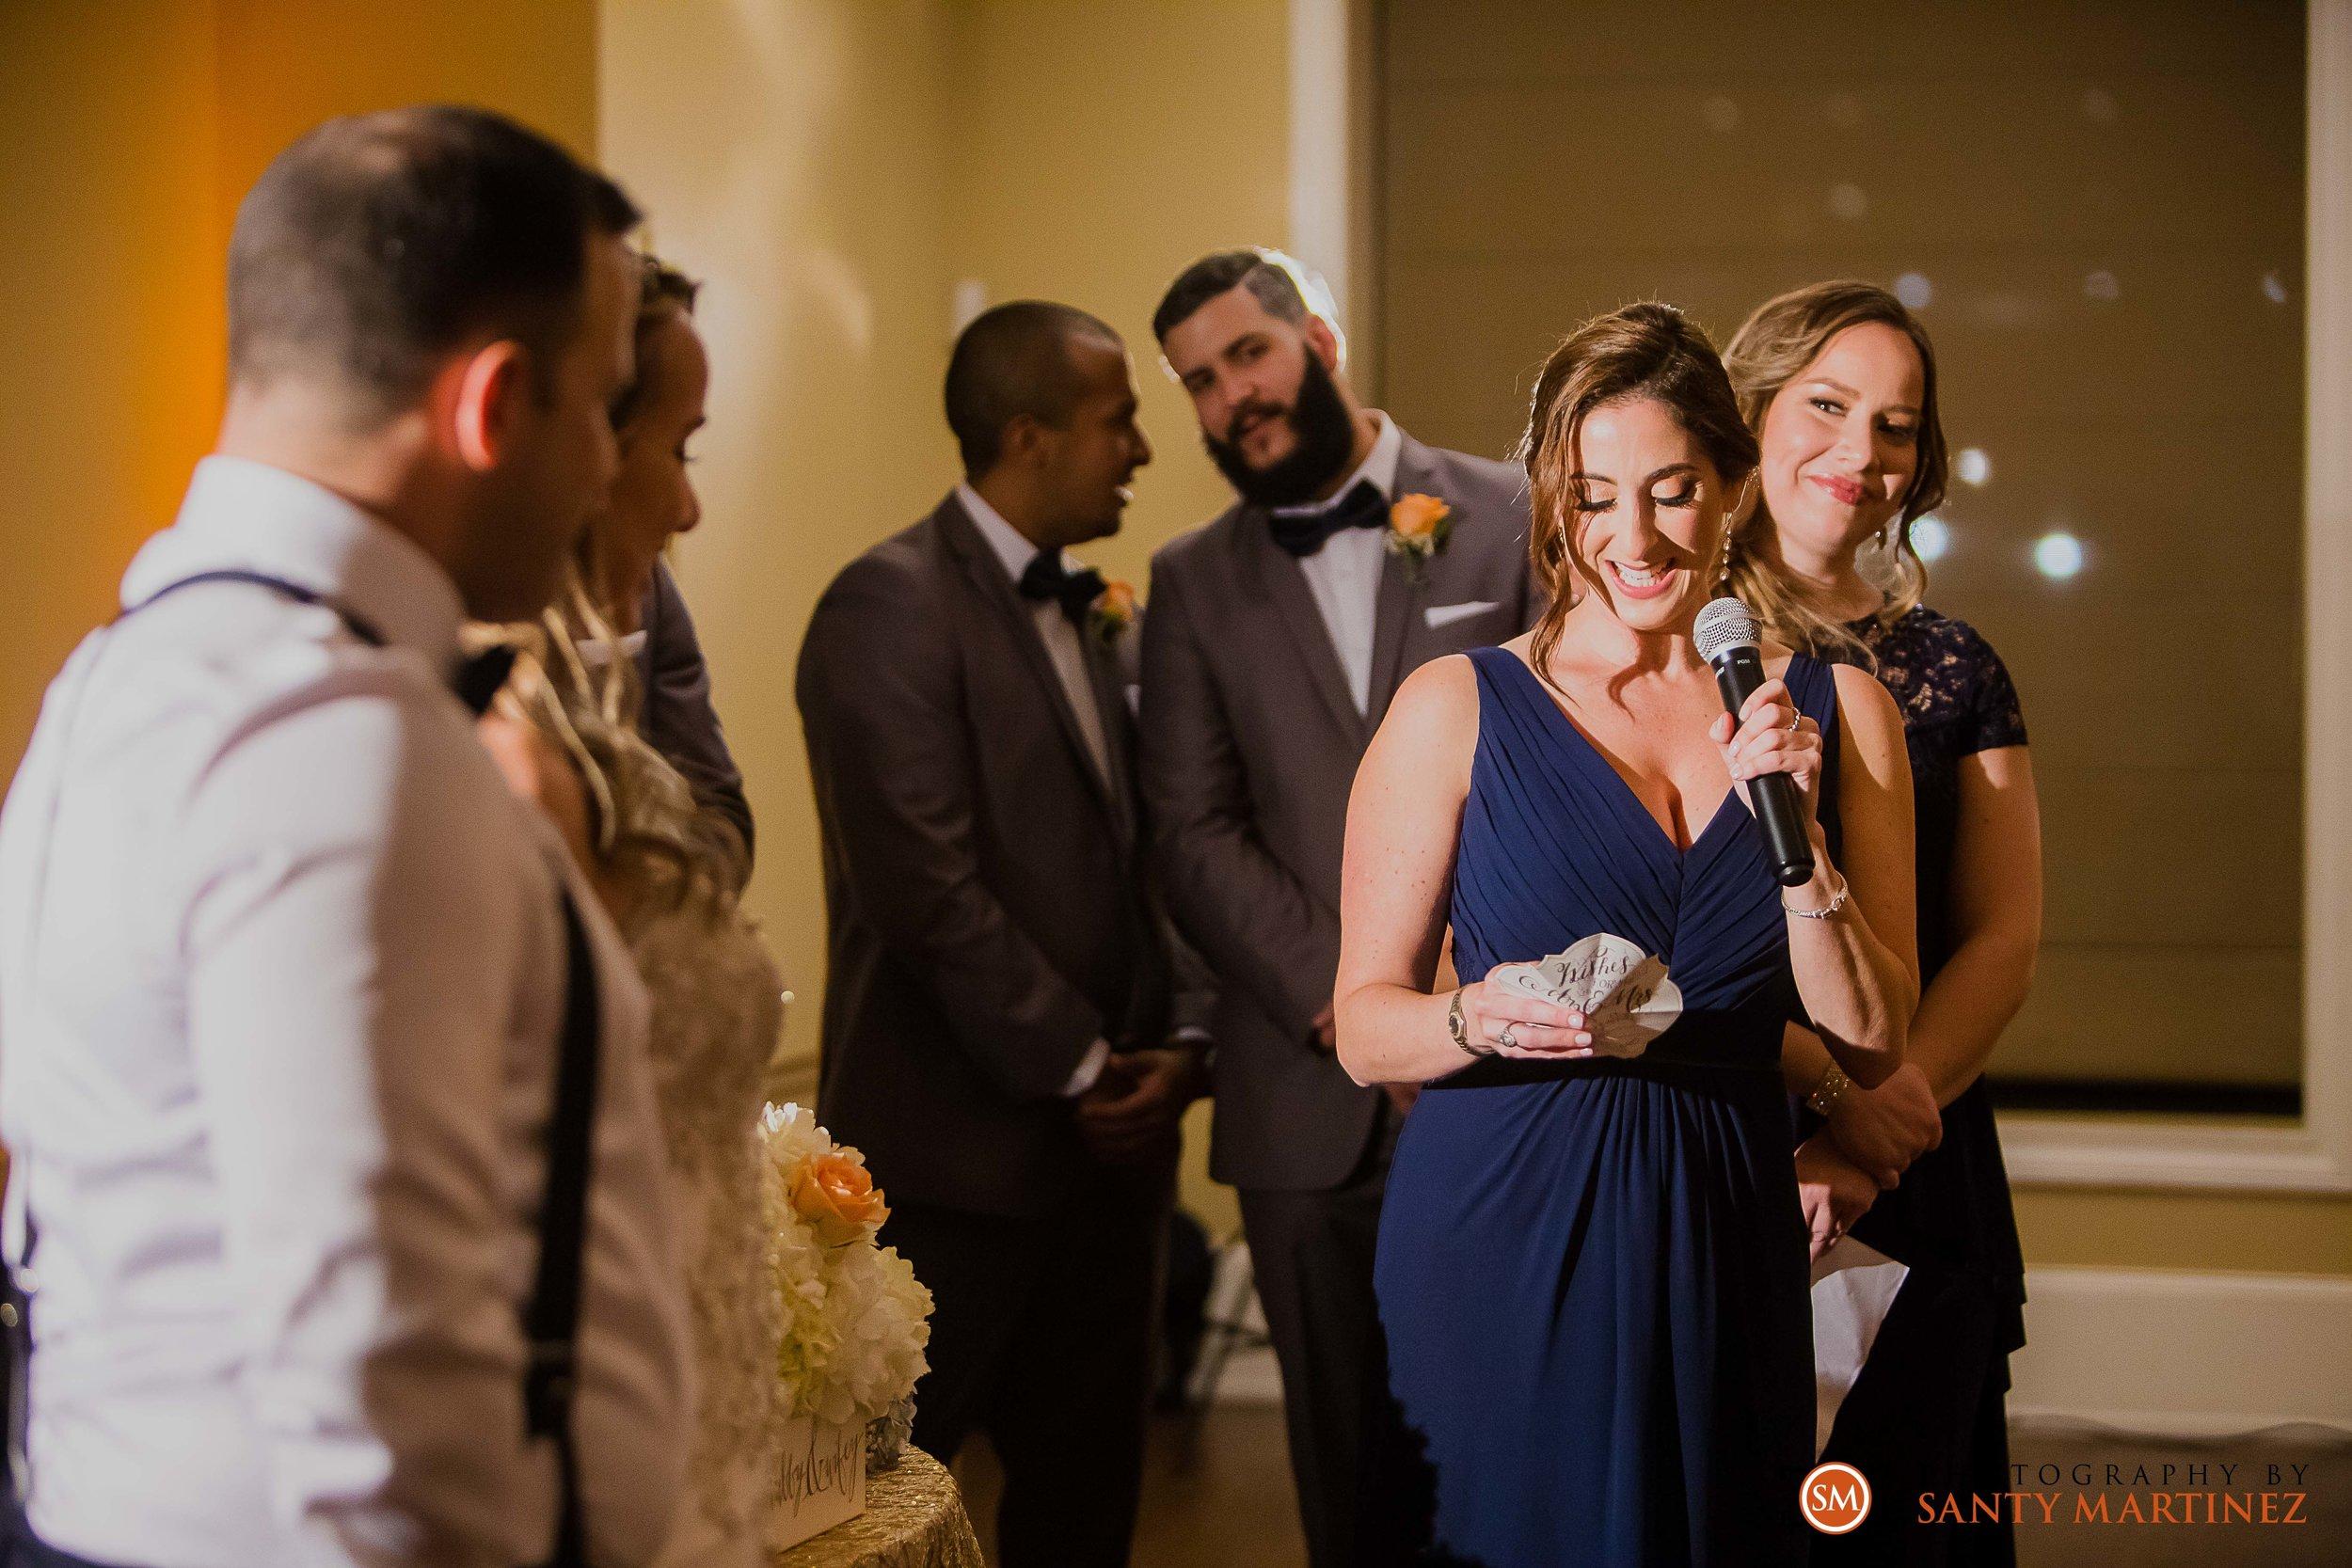 Wedding La Jolla Ballroom - Photography by Santy Martinez-47.jpg